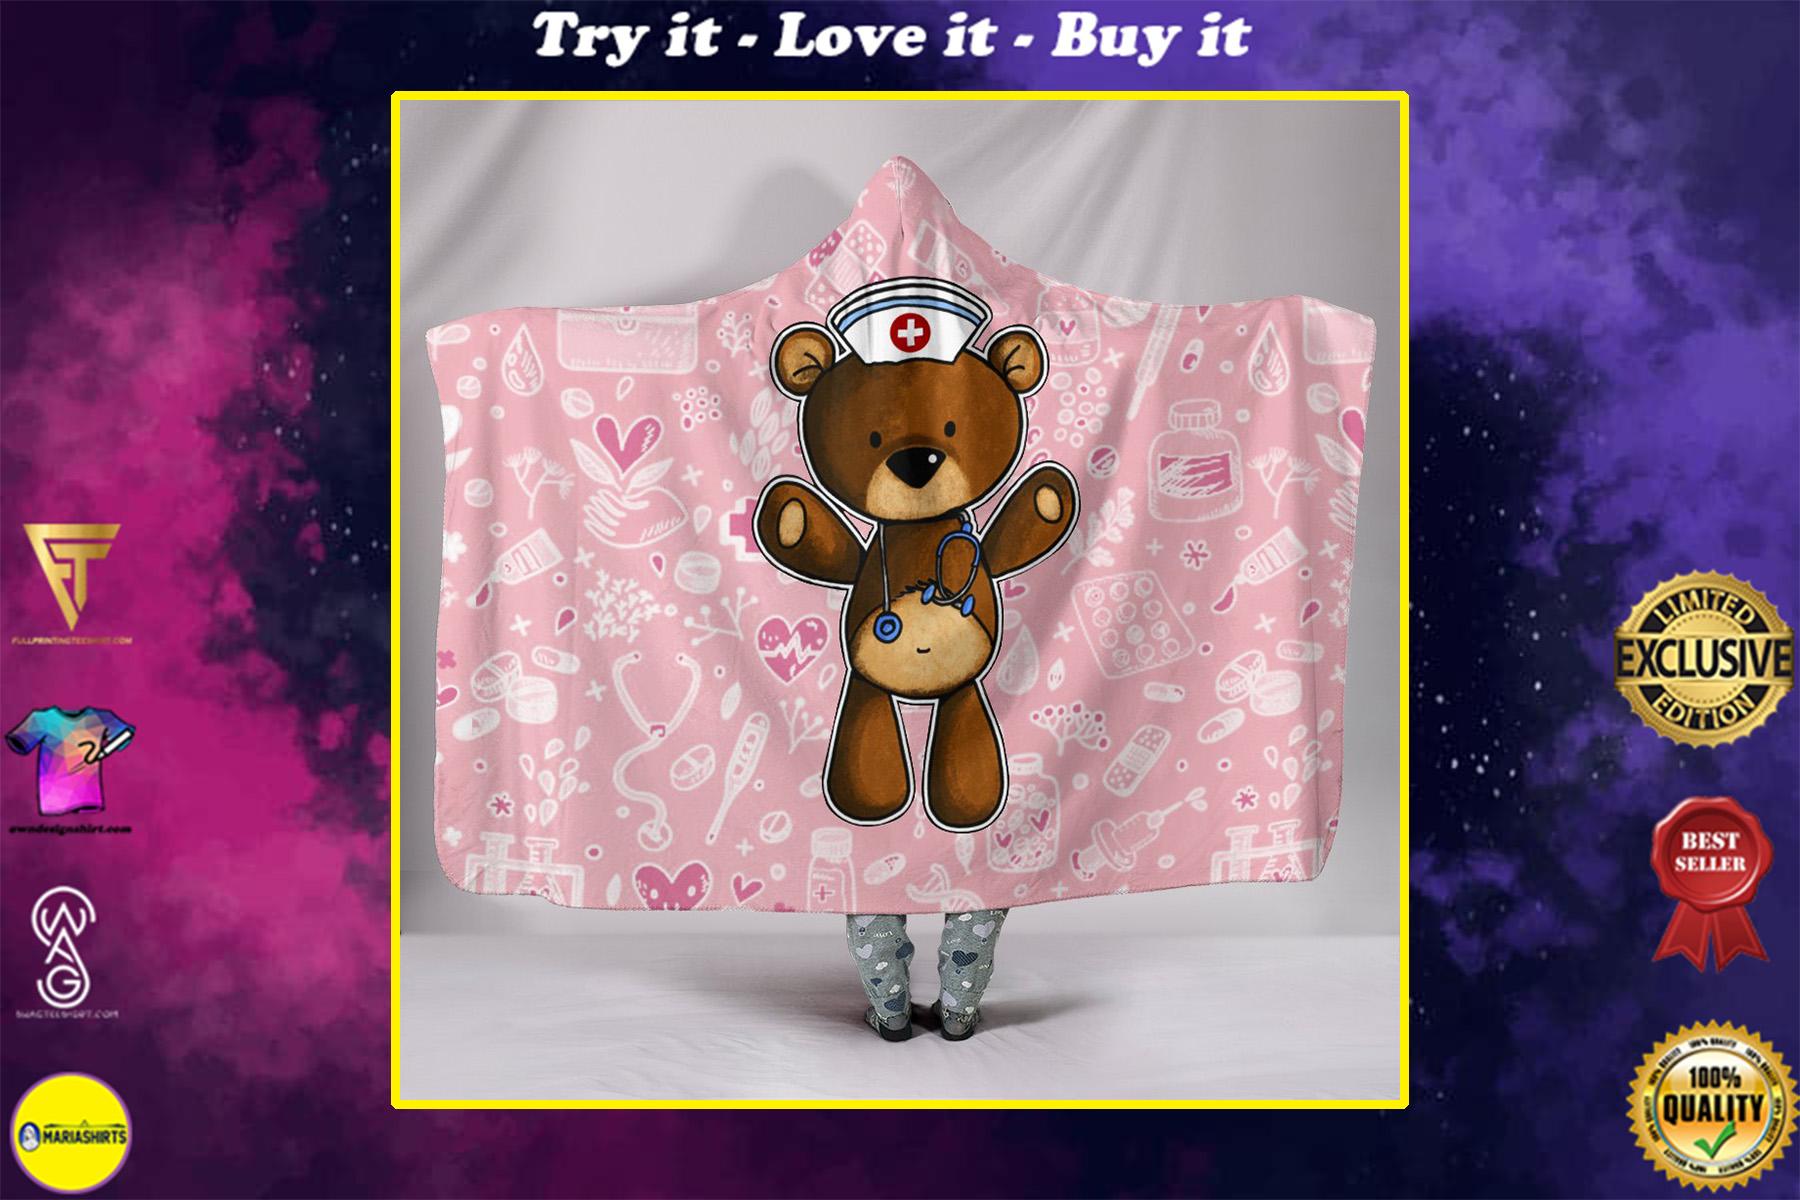 nurse bear full printing hooded blanket